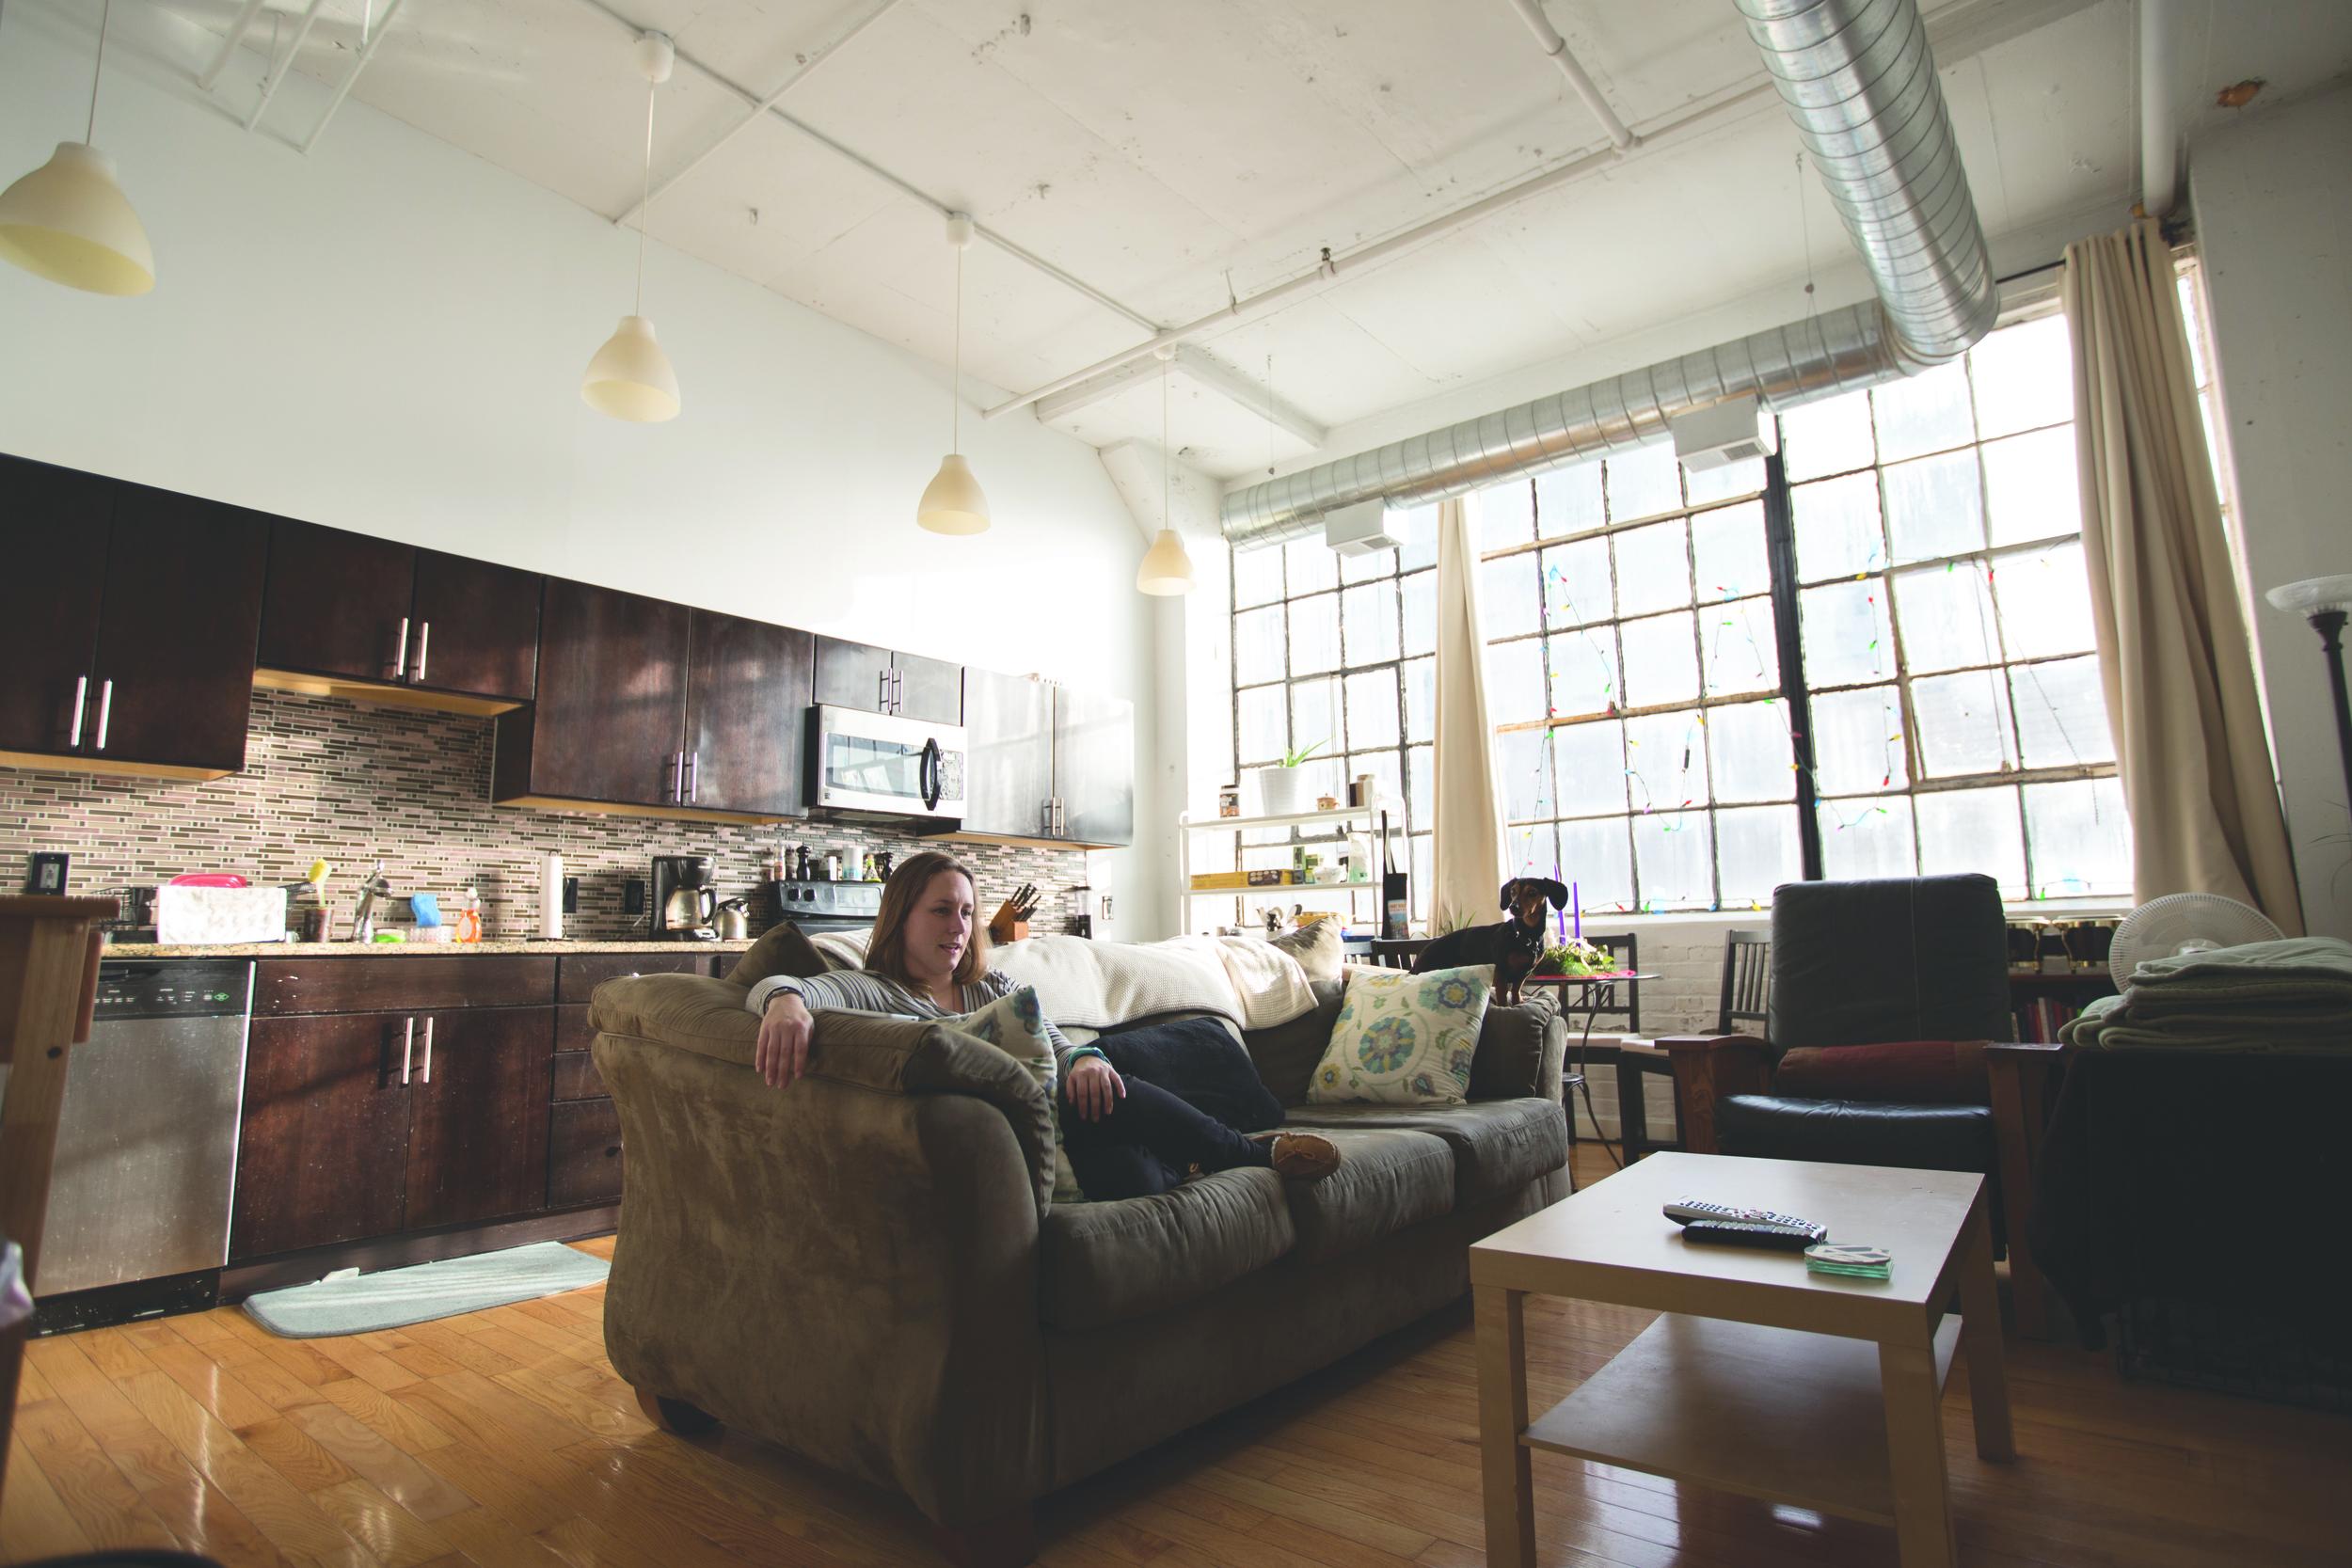 Krista Pleger enjoys her clutter-free apartment.